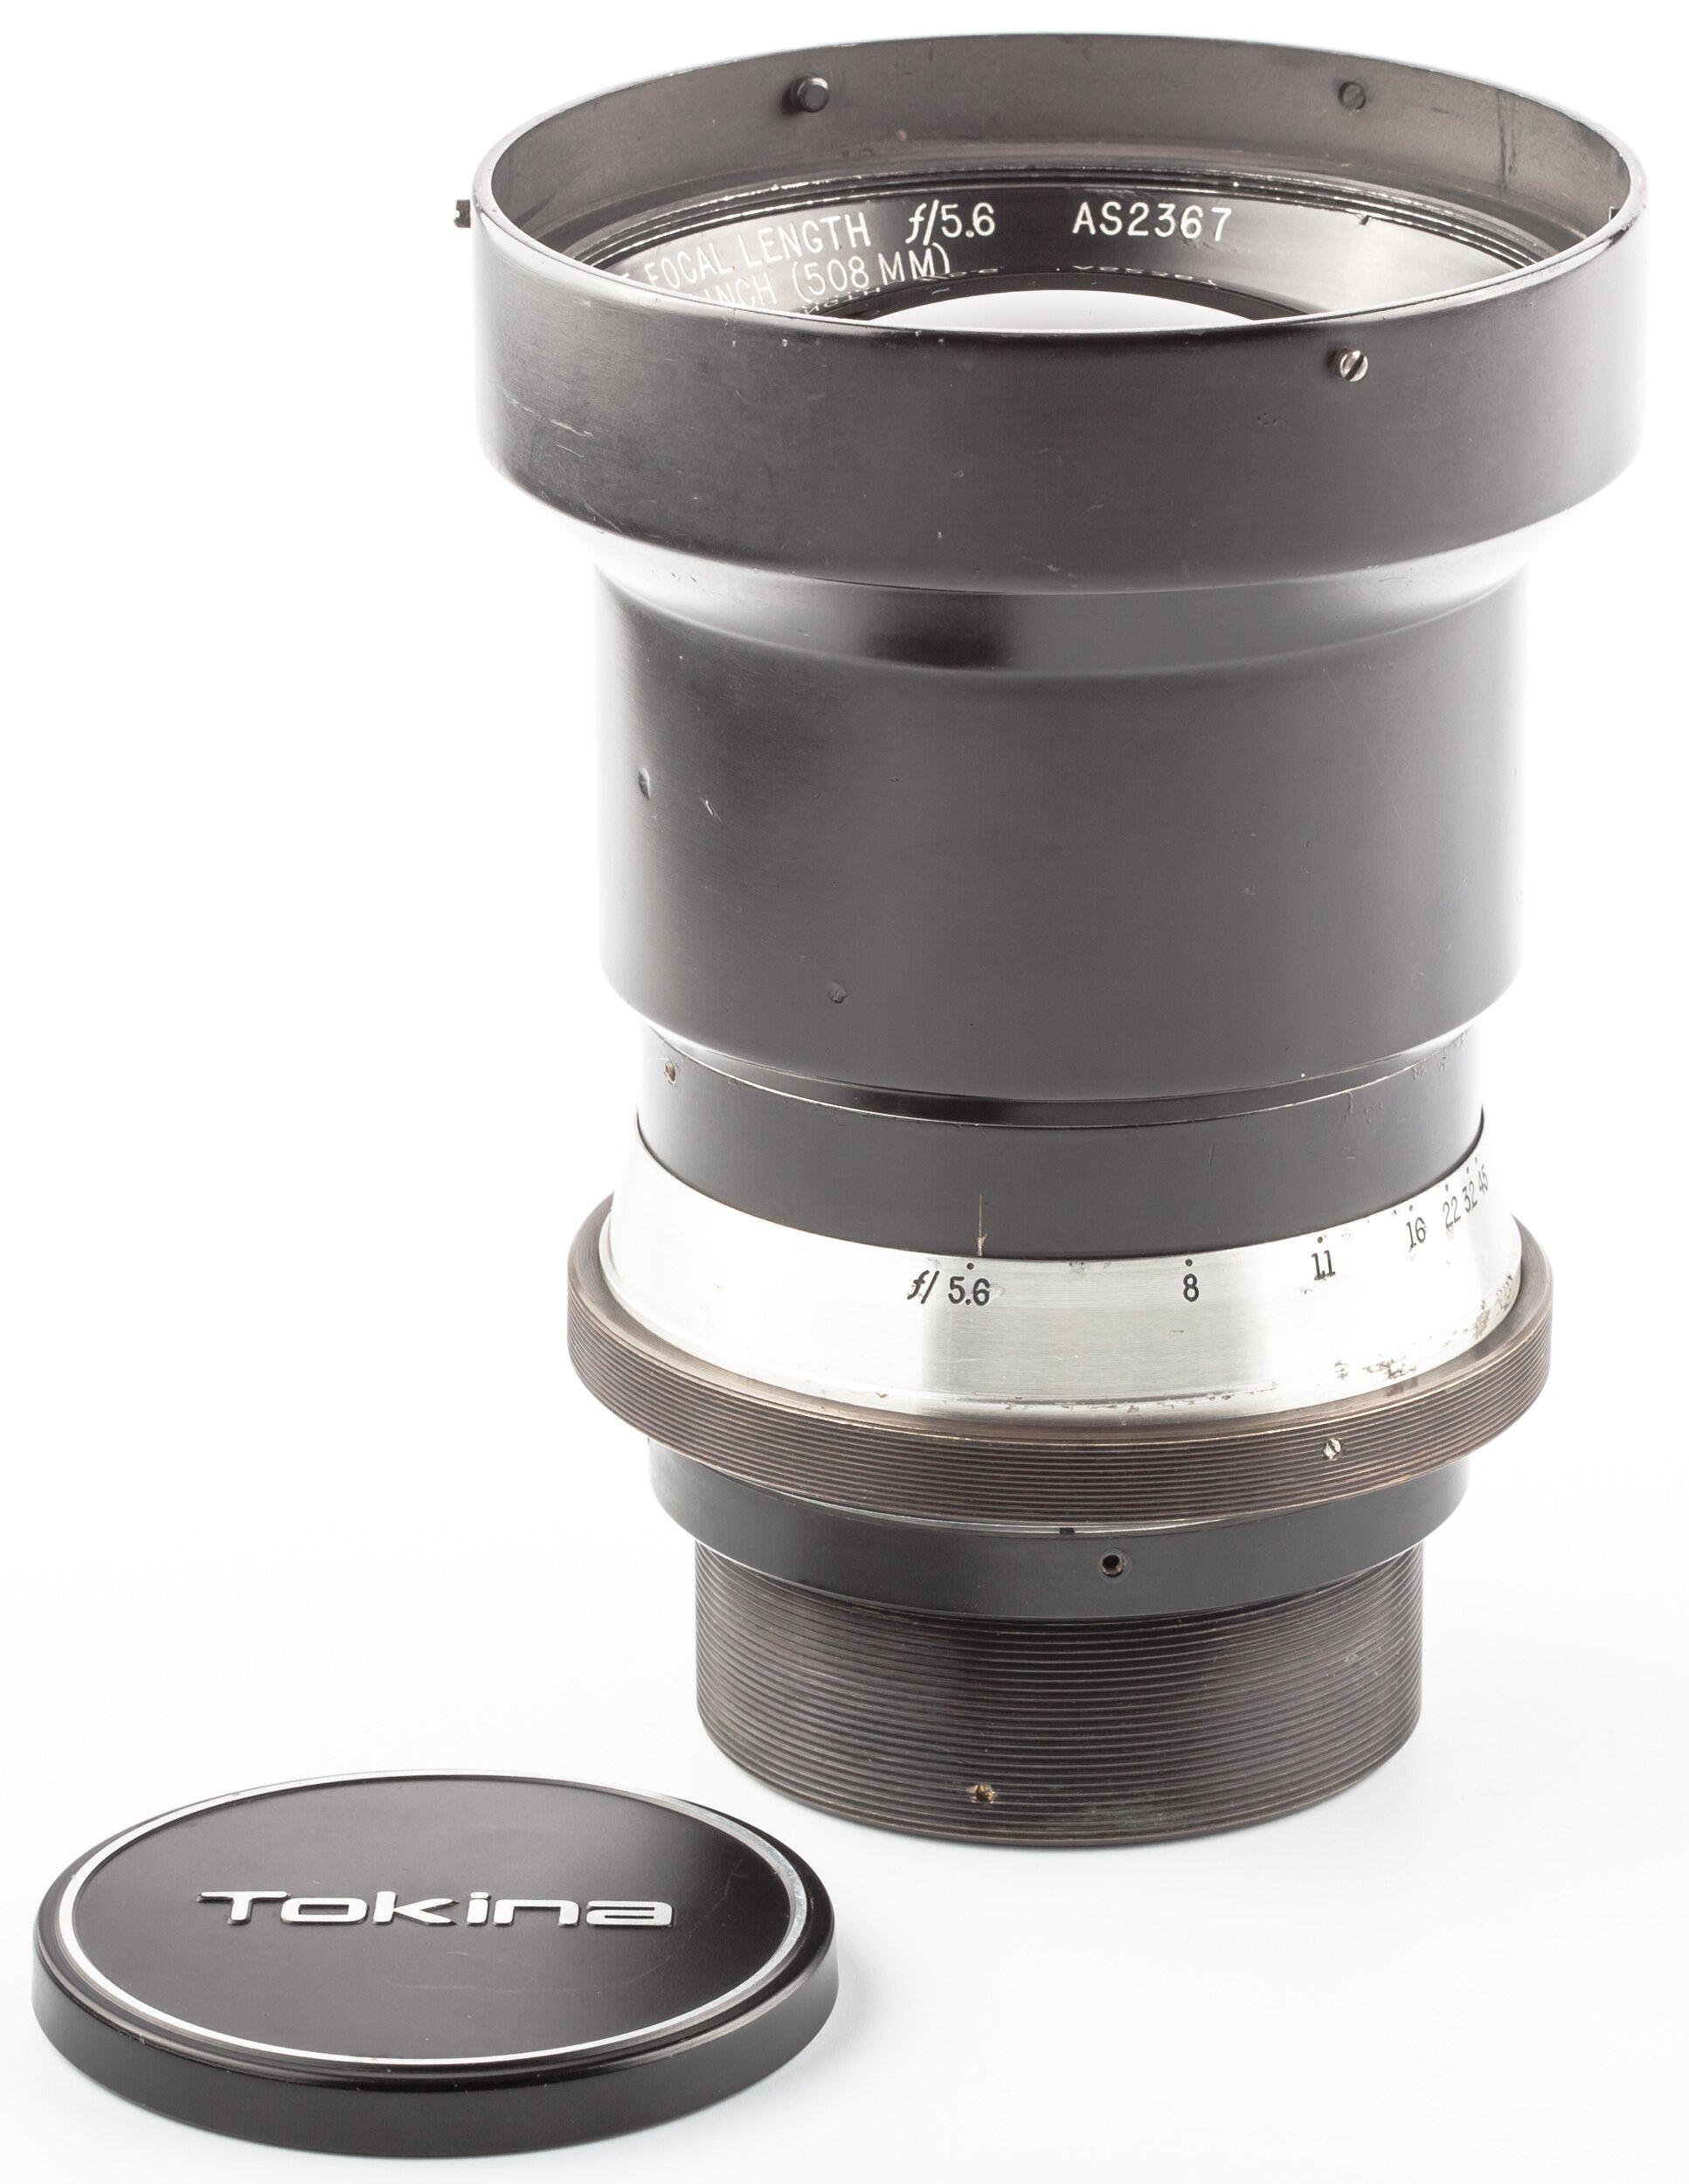 Bausch & Lomb Telephoto Anastigmat 5,6 20 inch (508mm)